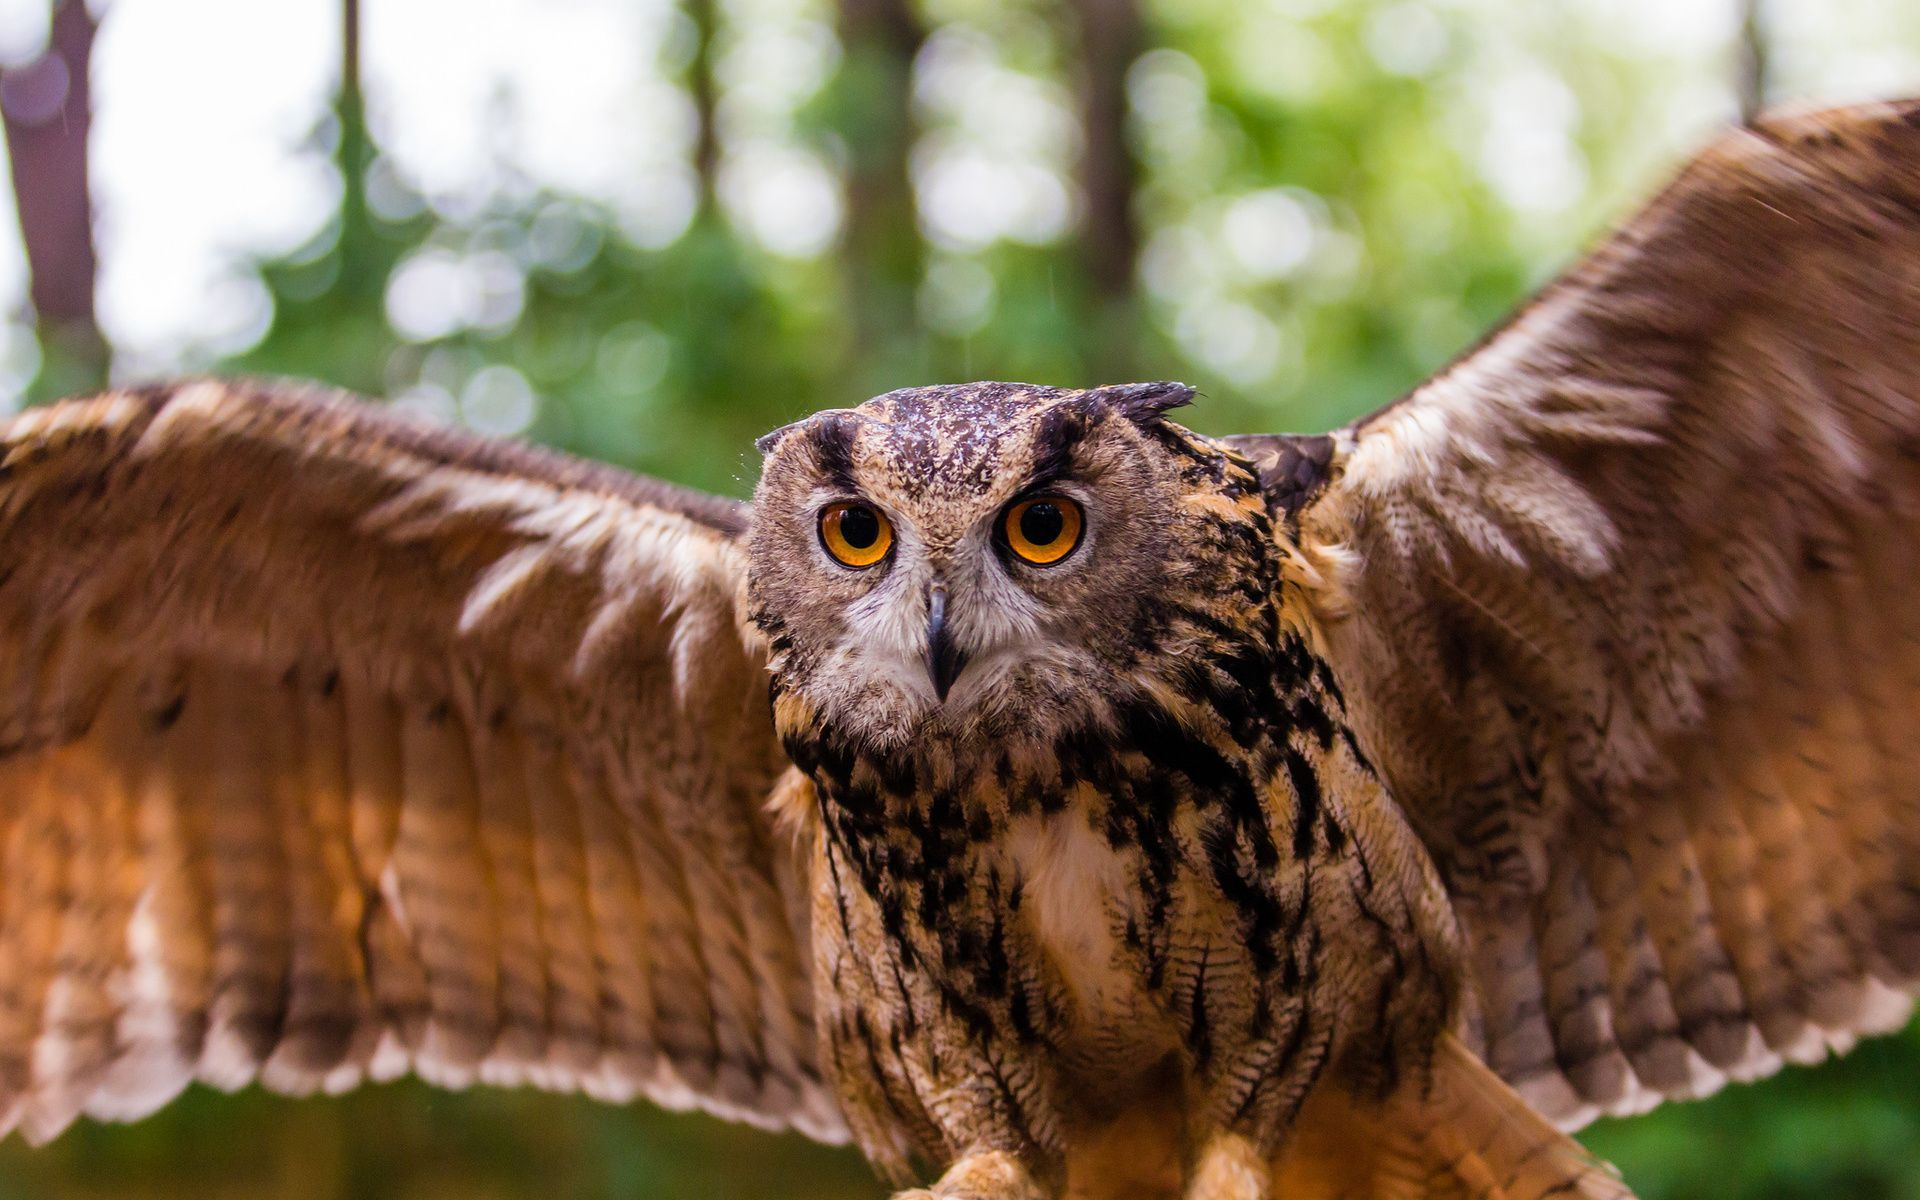 Flying owl HD Wallpaper 1920x1080 Flying owl HD Wallpaper 1920x1200 1920x1200